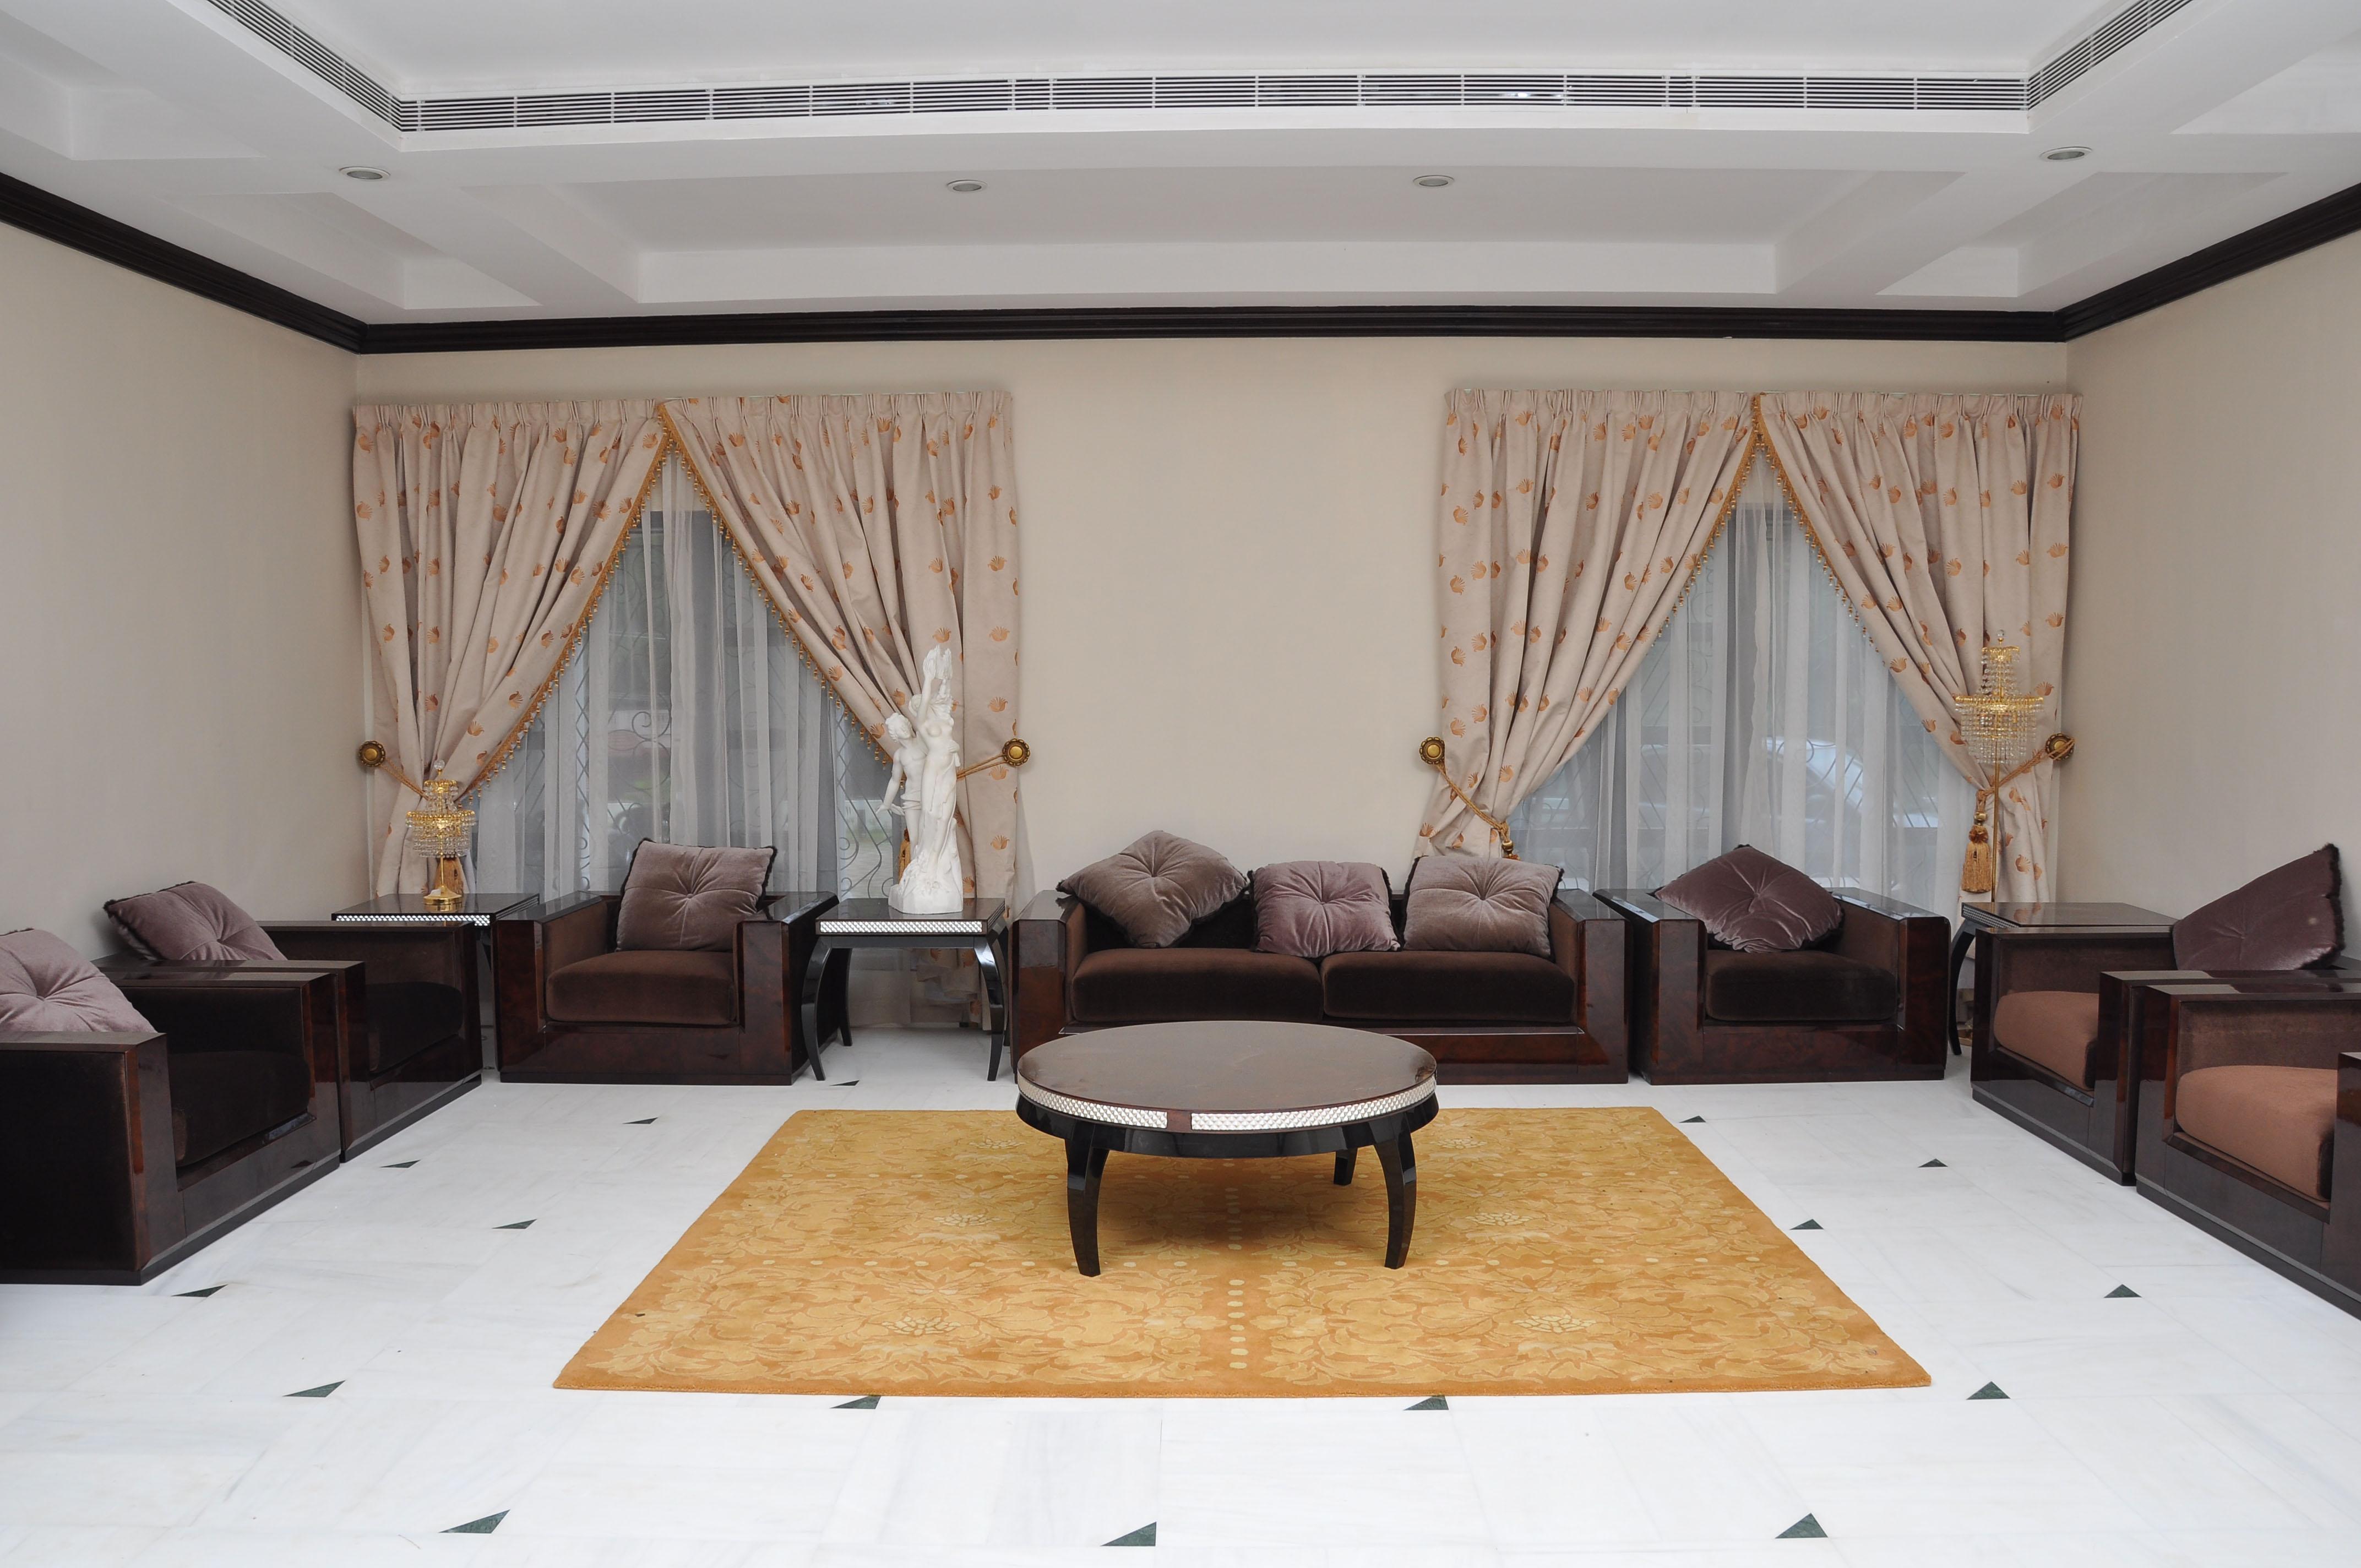 Royal Room, Architect, Images, Stock, Sofa, HQ Photo